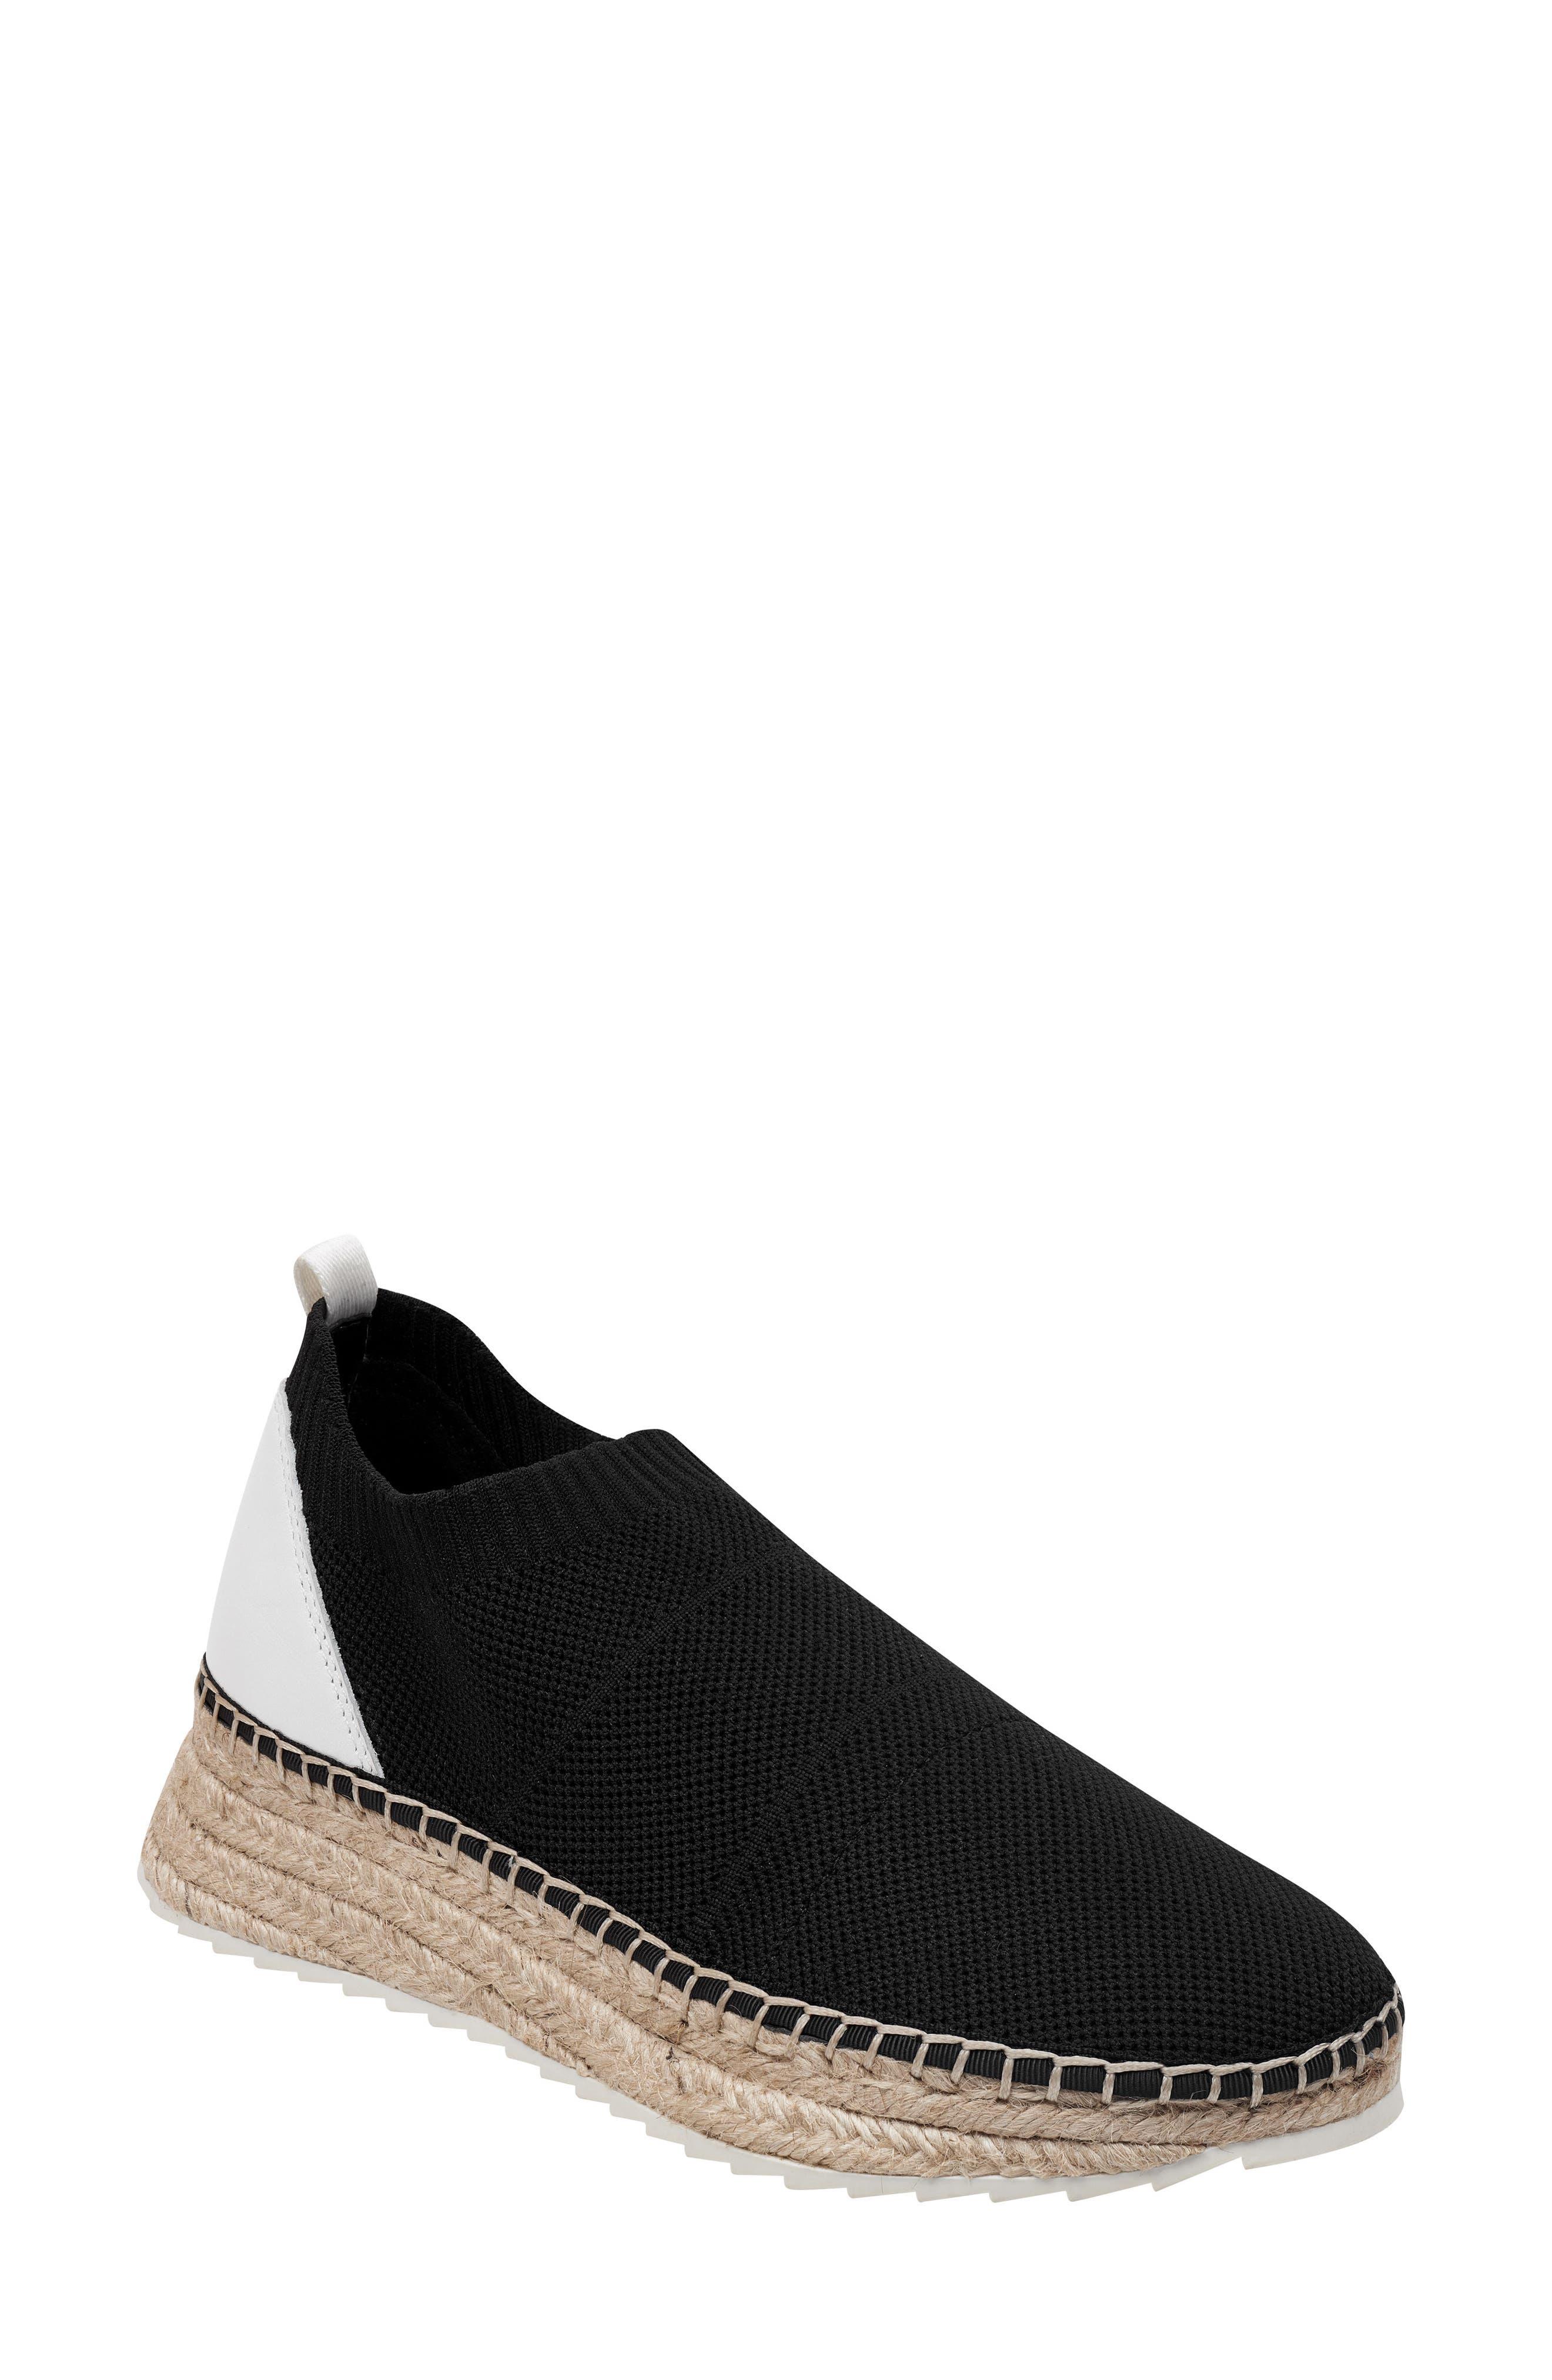 MARC FISHER LTD,                             Jilly Espadrille Sneaker,                             Main thumbnail 1, color,                             BLACK FABRIC